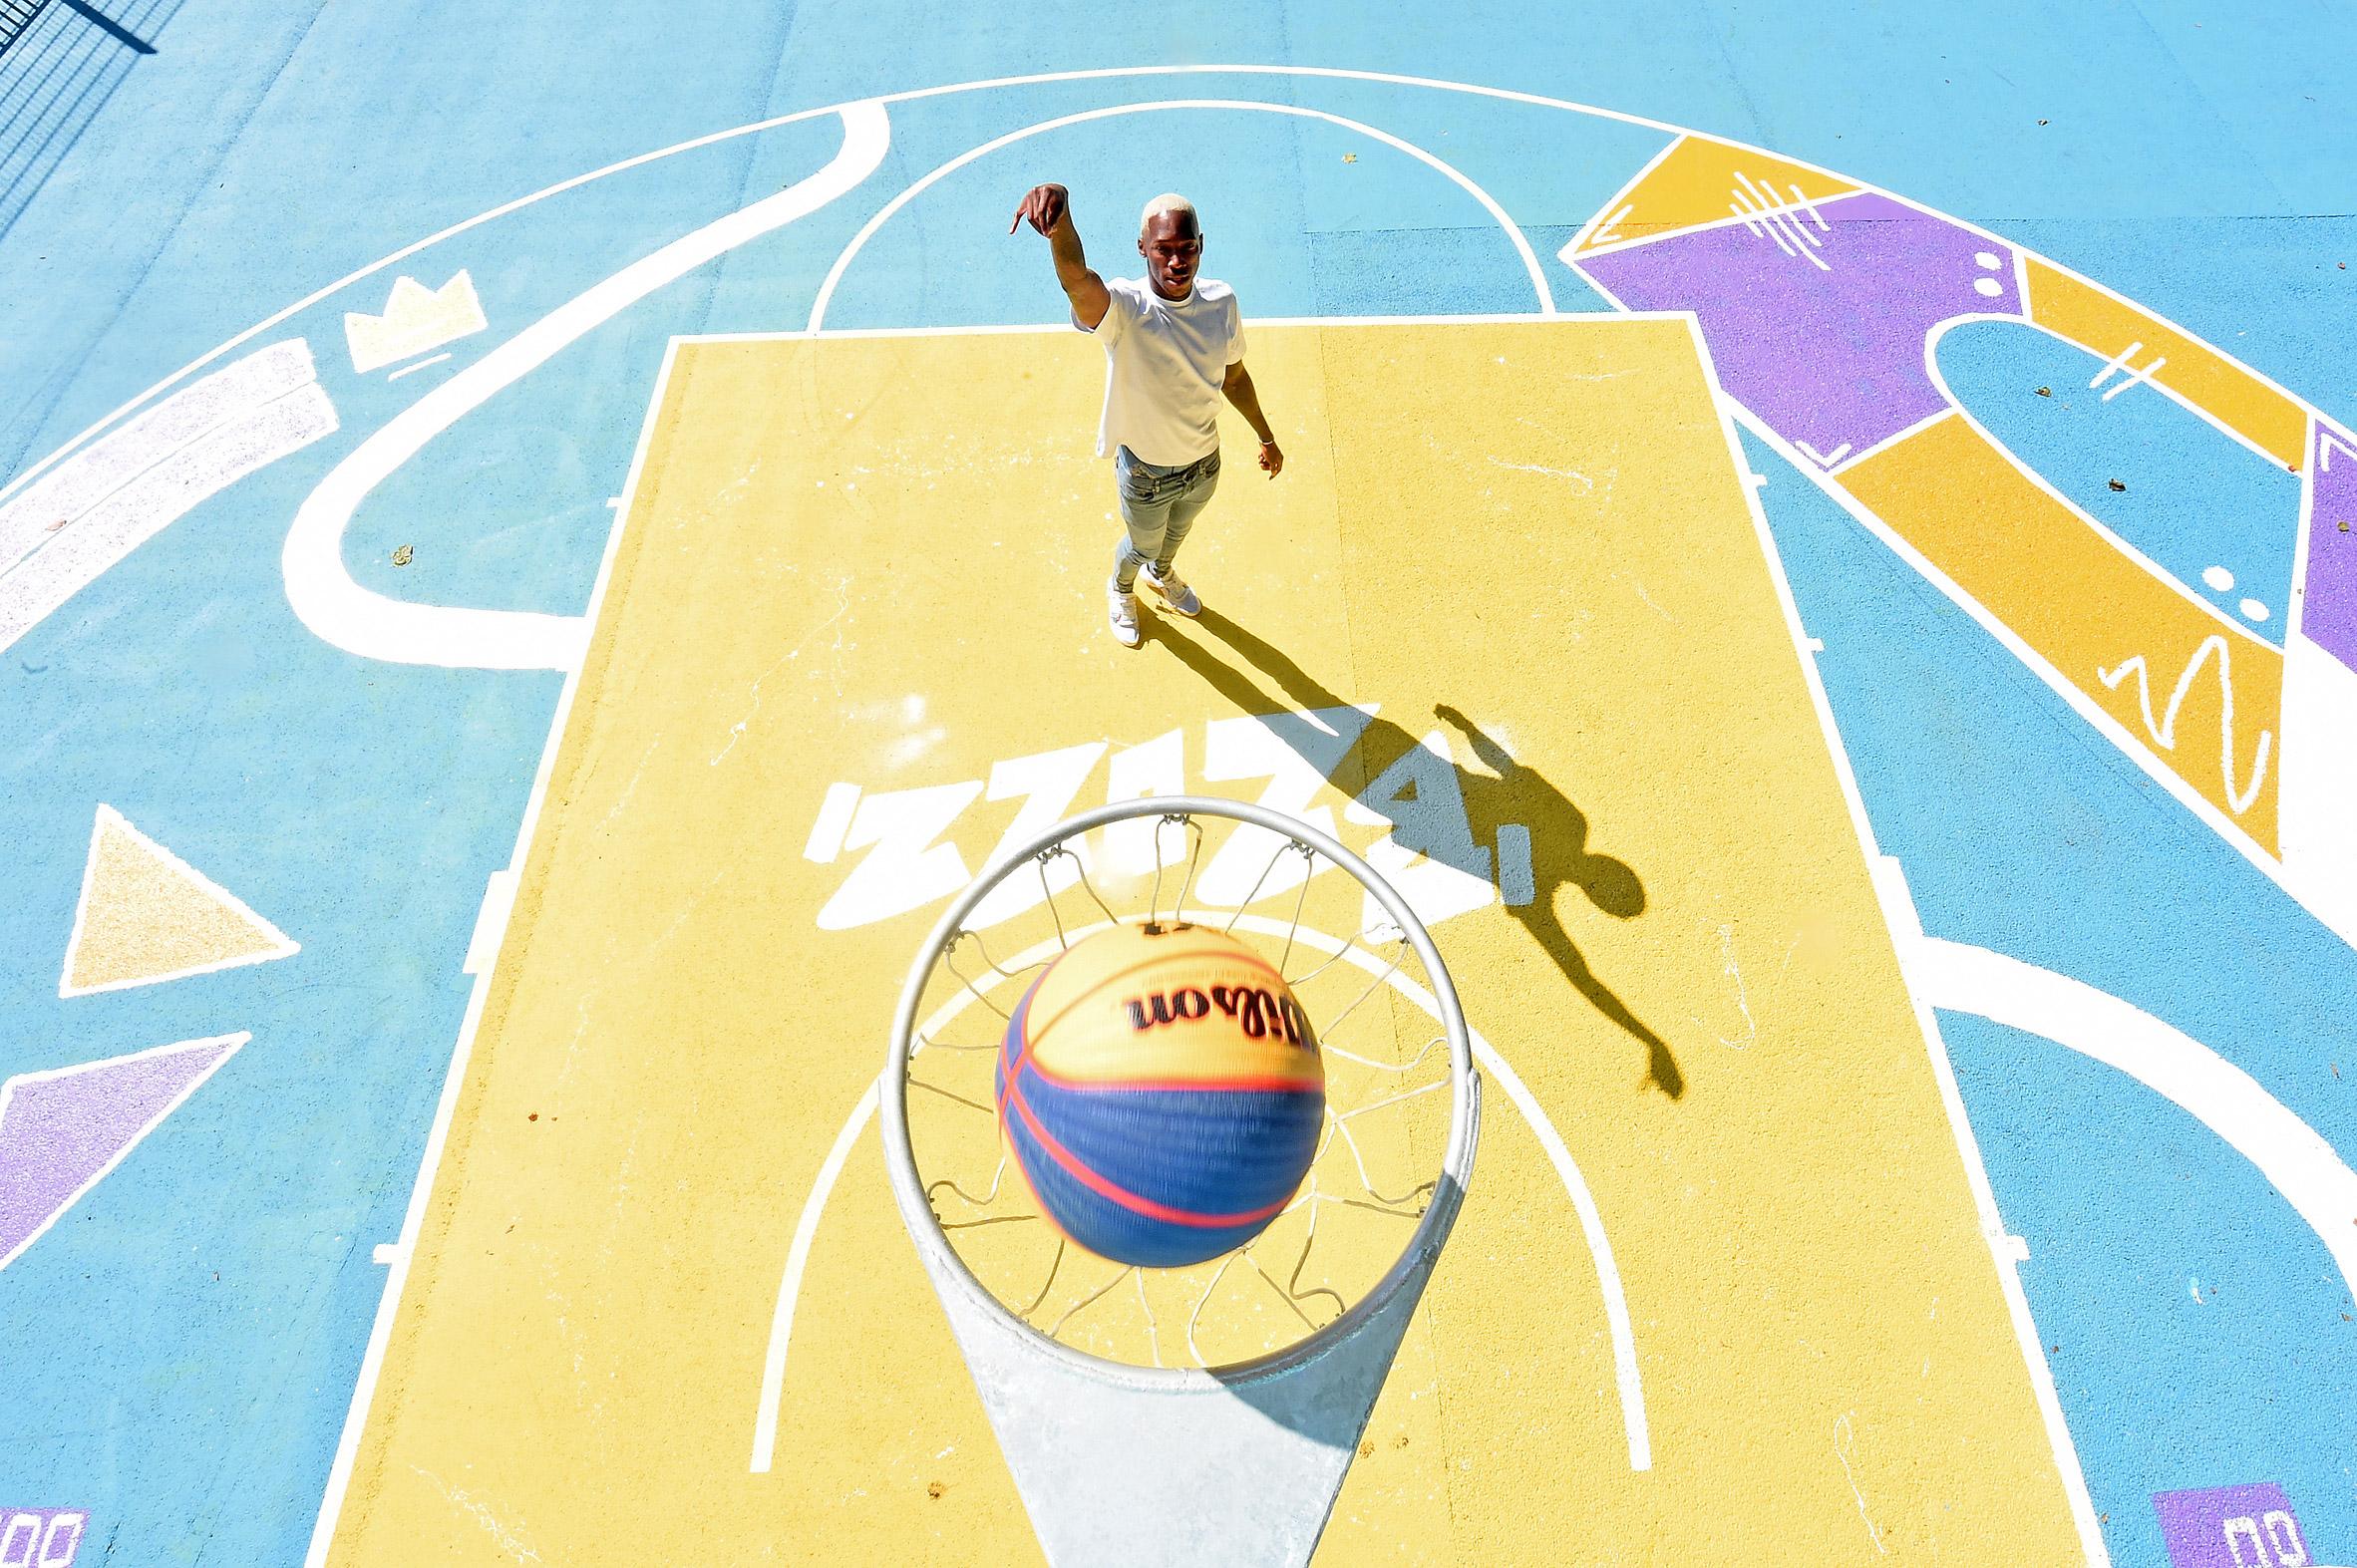 A player shoots a ball into a basketball hoop